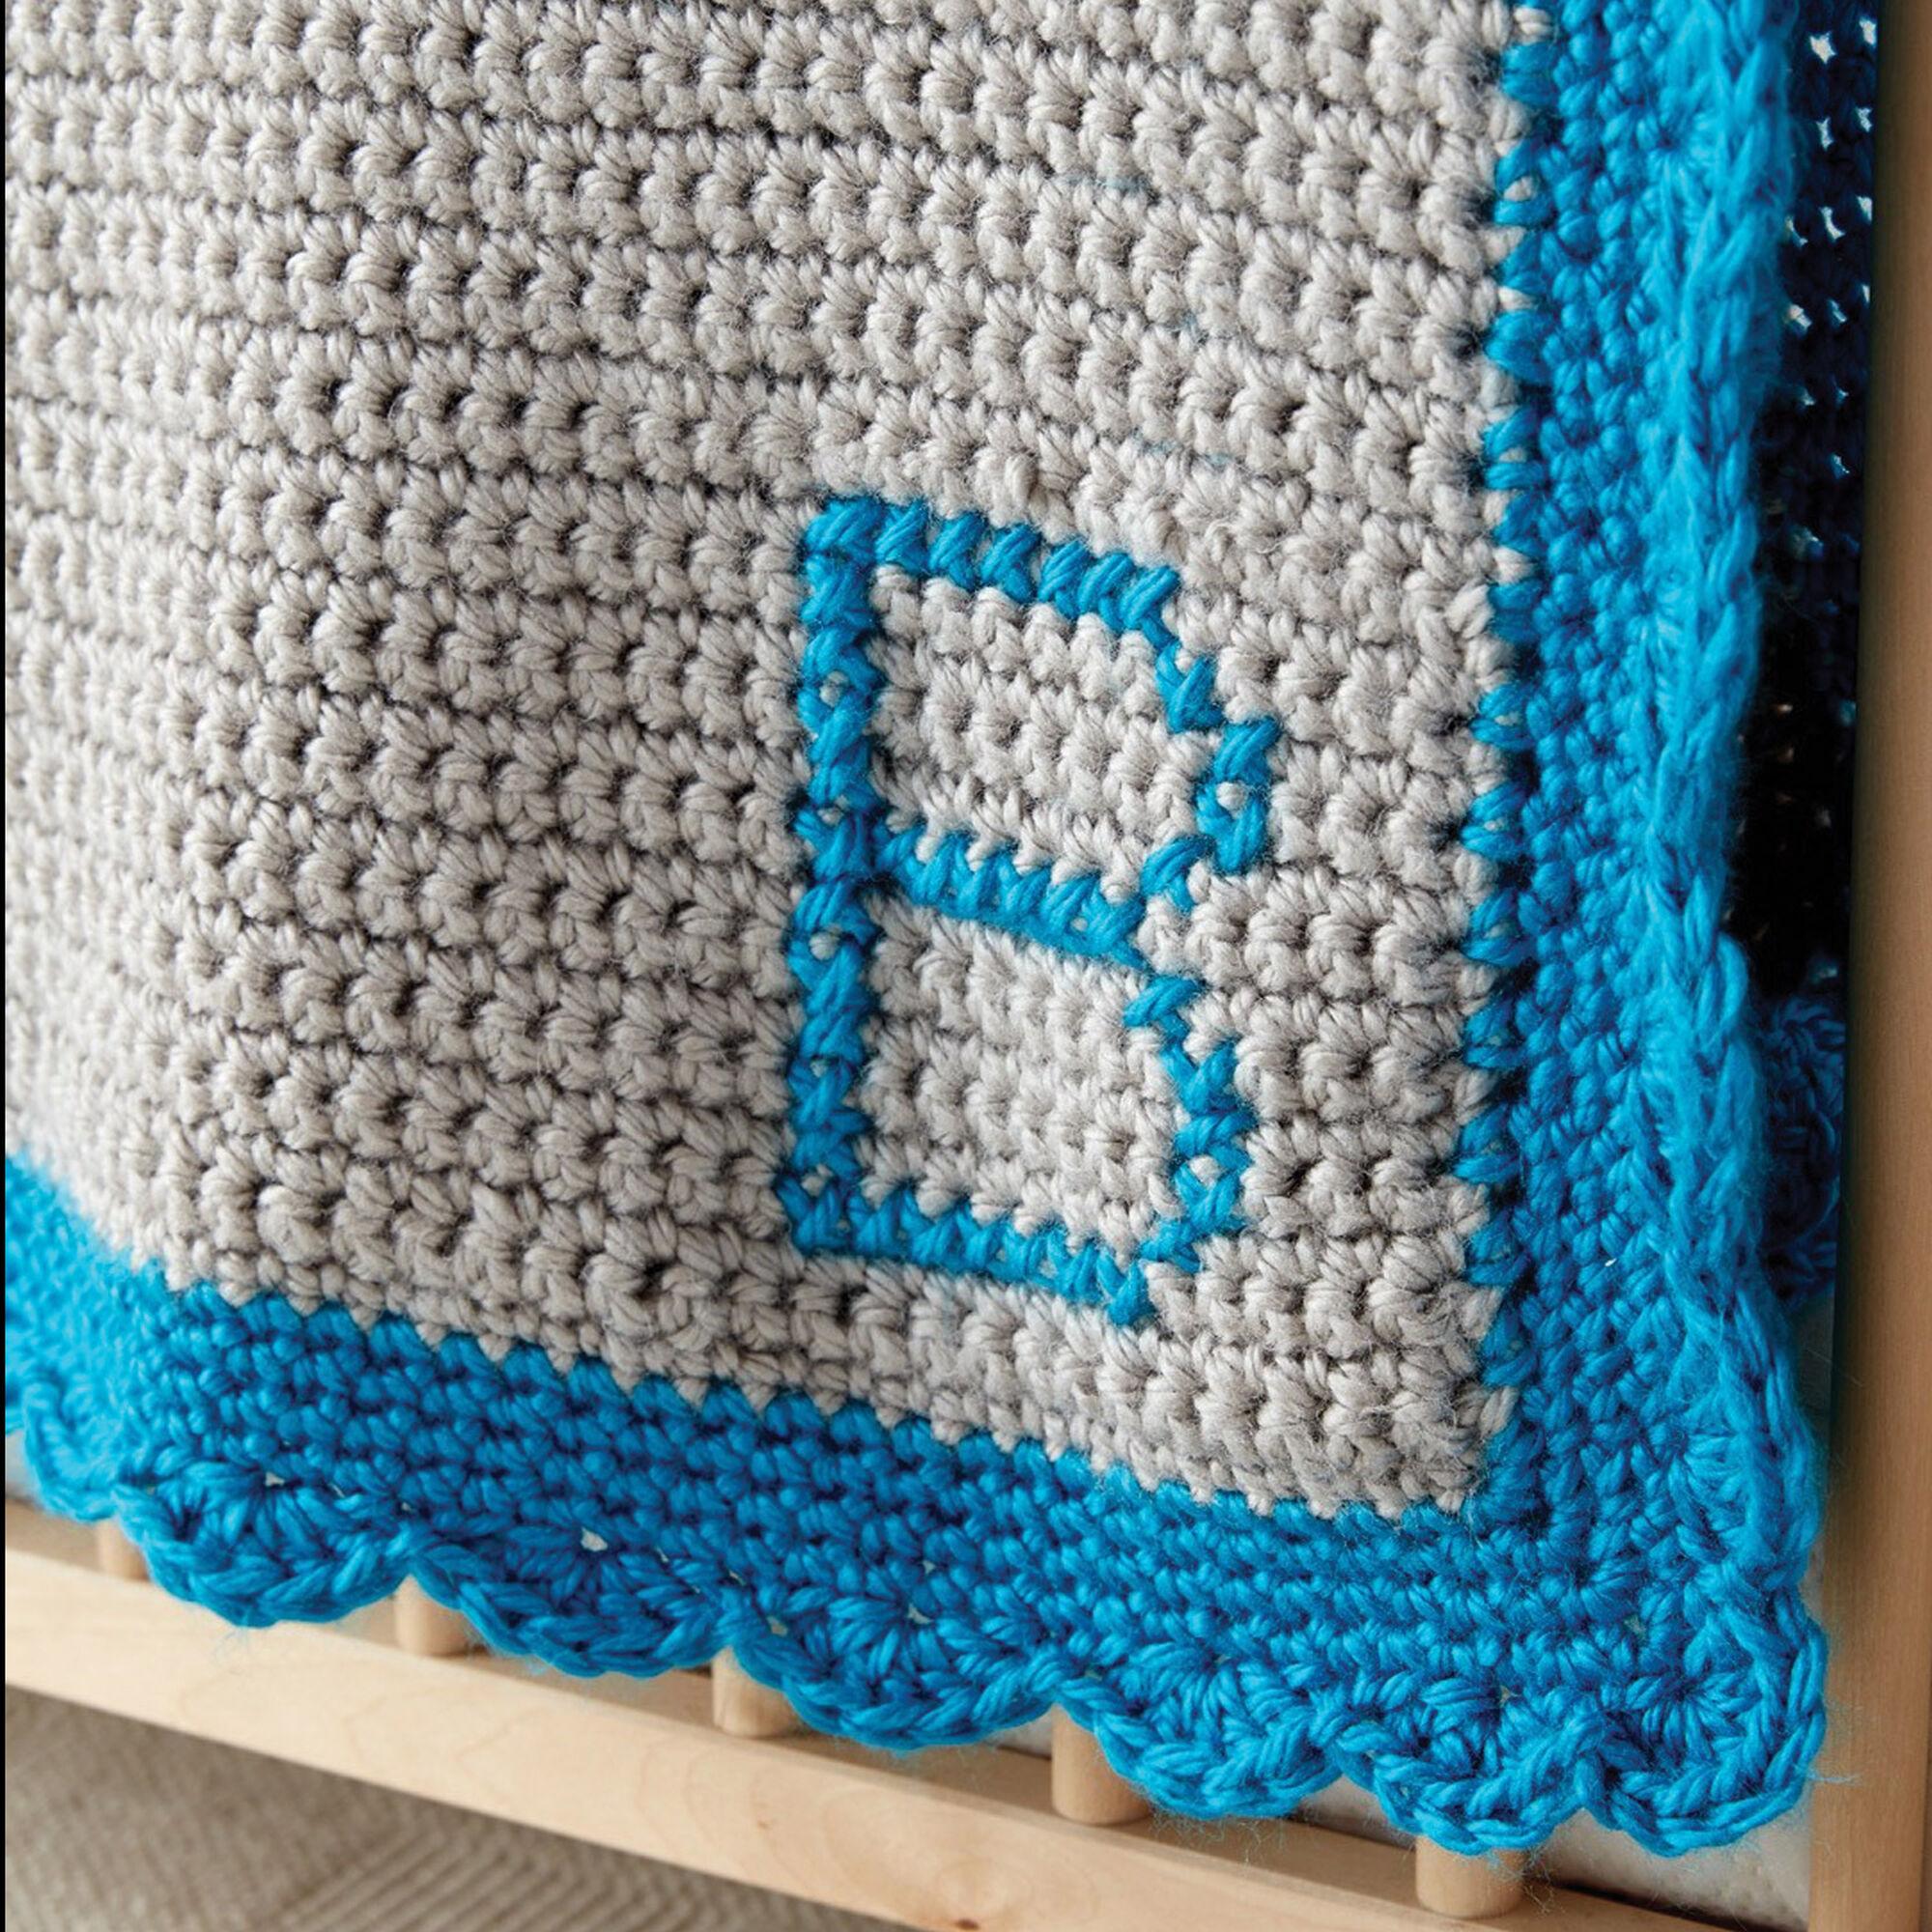 Bernat Crochet Monogram Baby Blanket | Yarnspirations